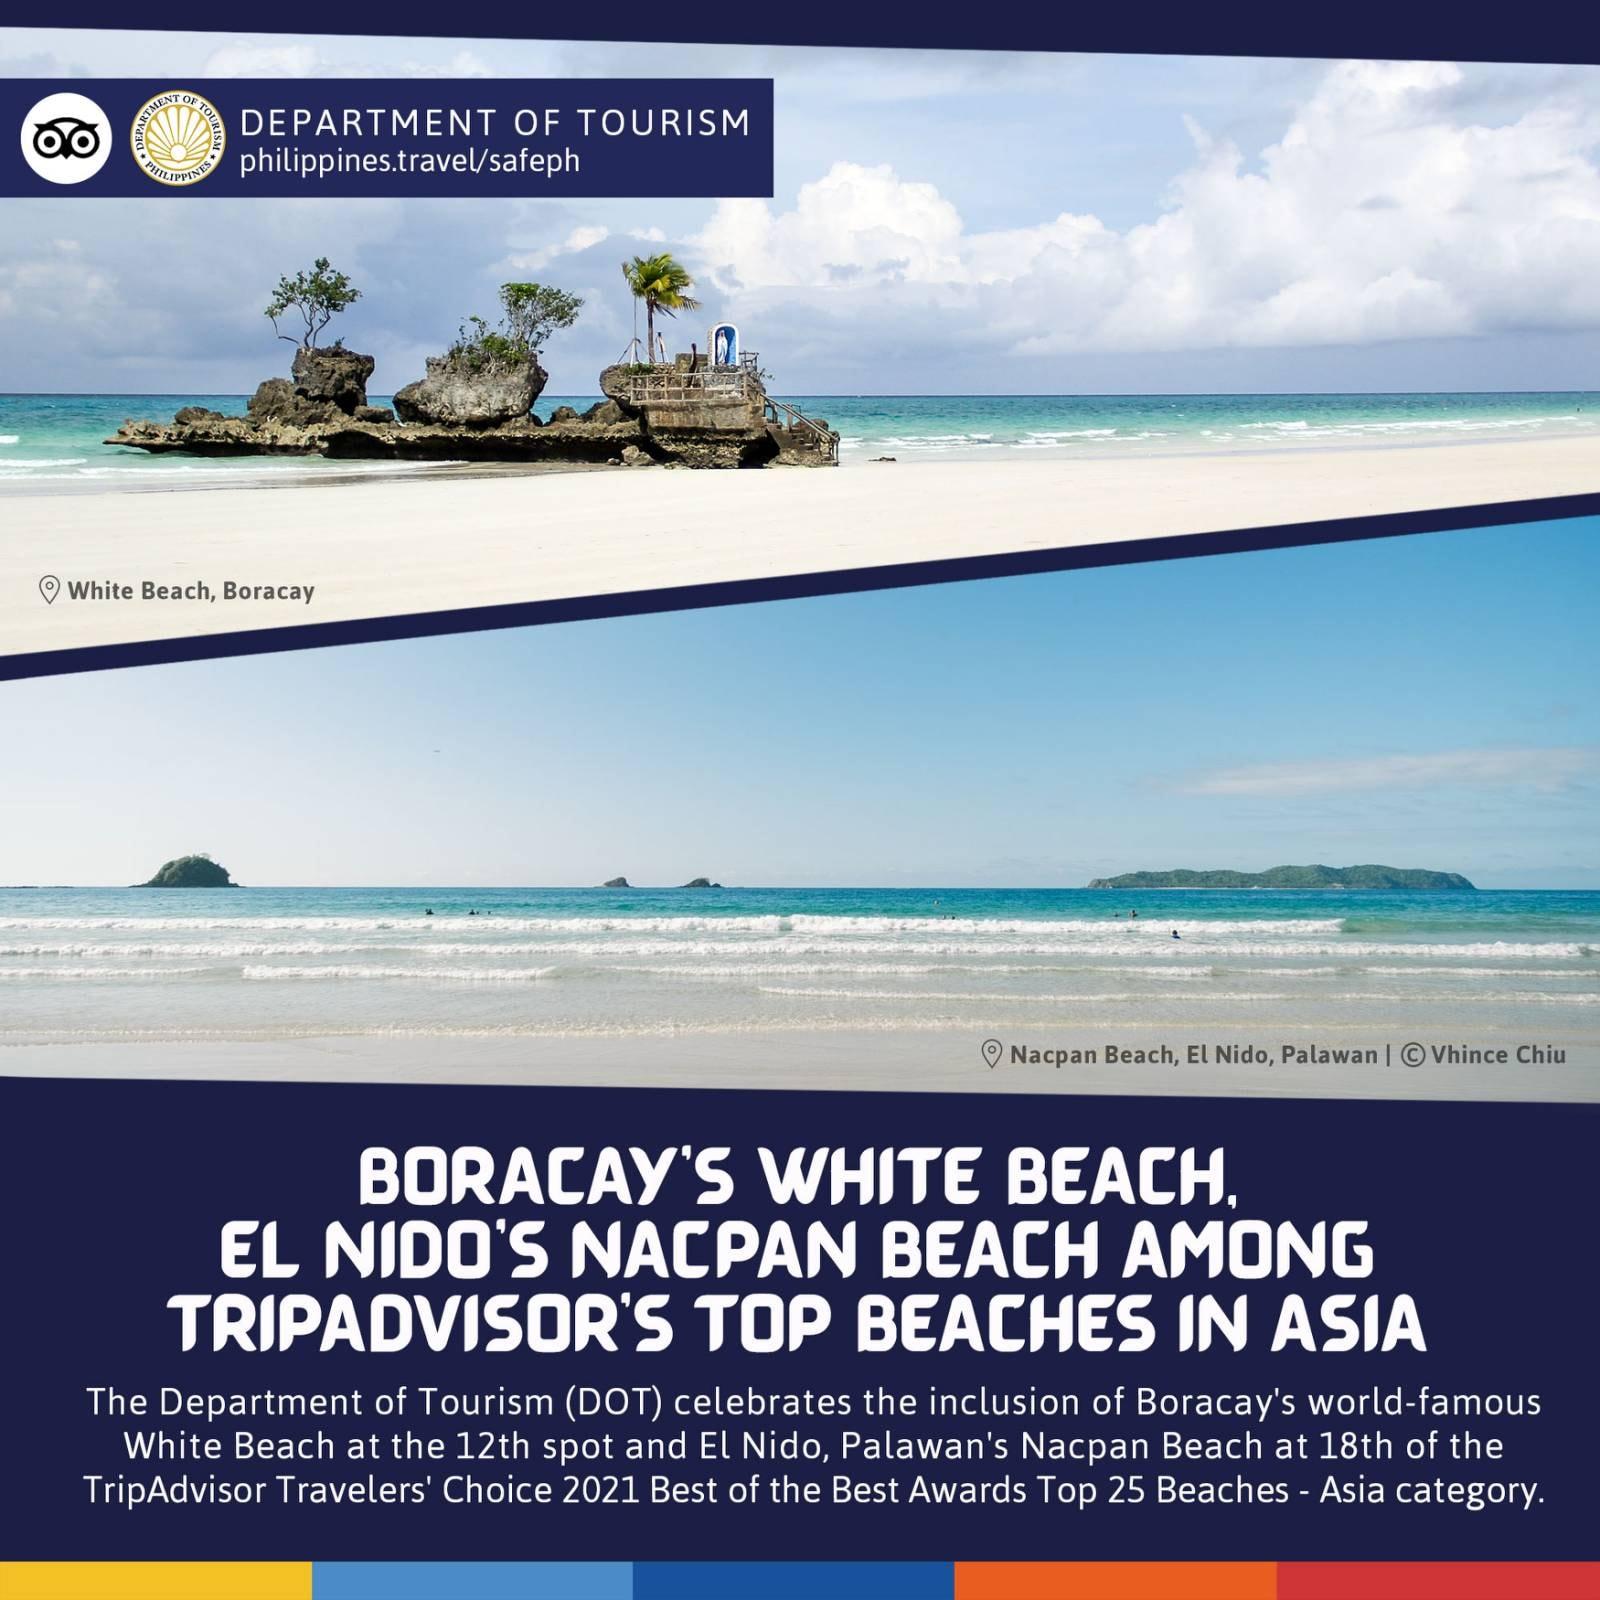 Tripadvisor's Top Beaches in Asia 2021   Boracay's White Beach, El Nido's Nacpan Beach Made It on the List!